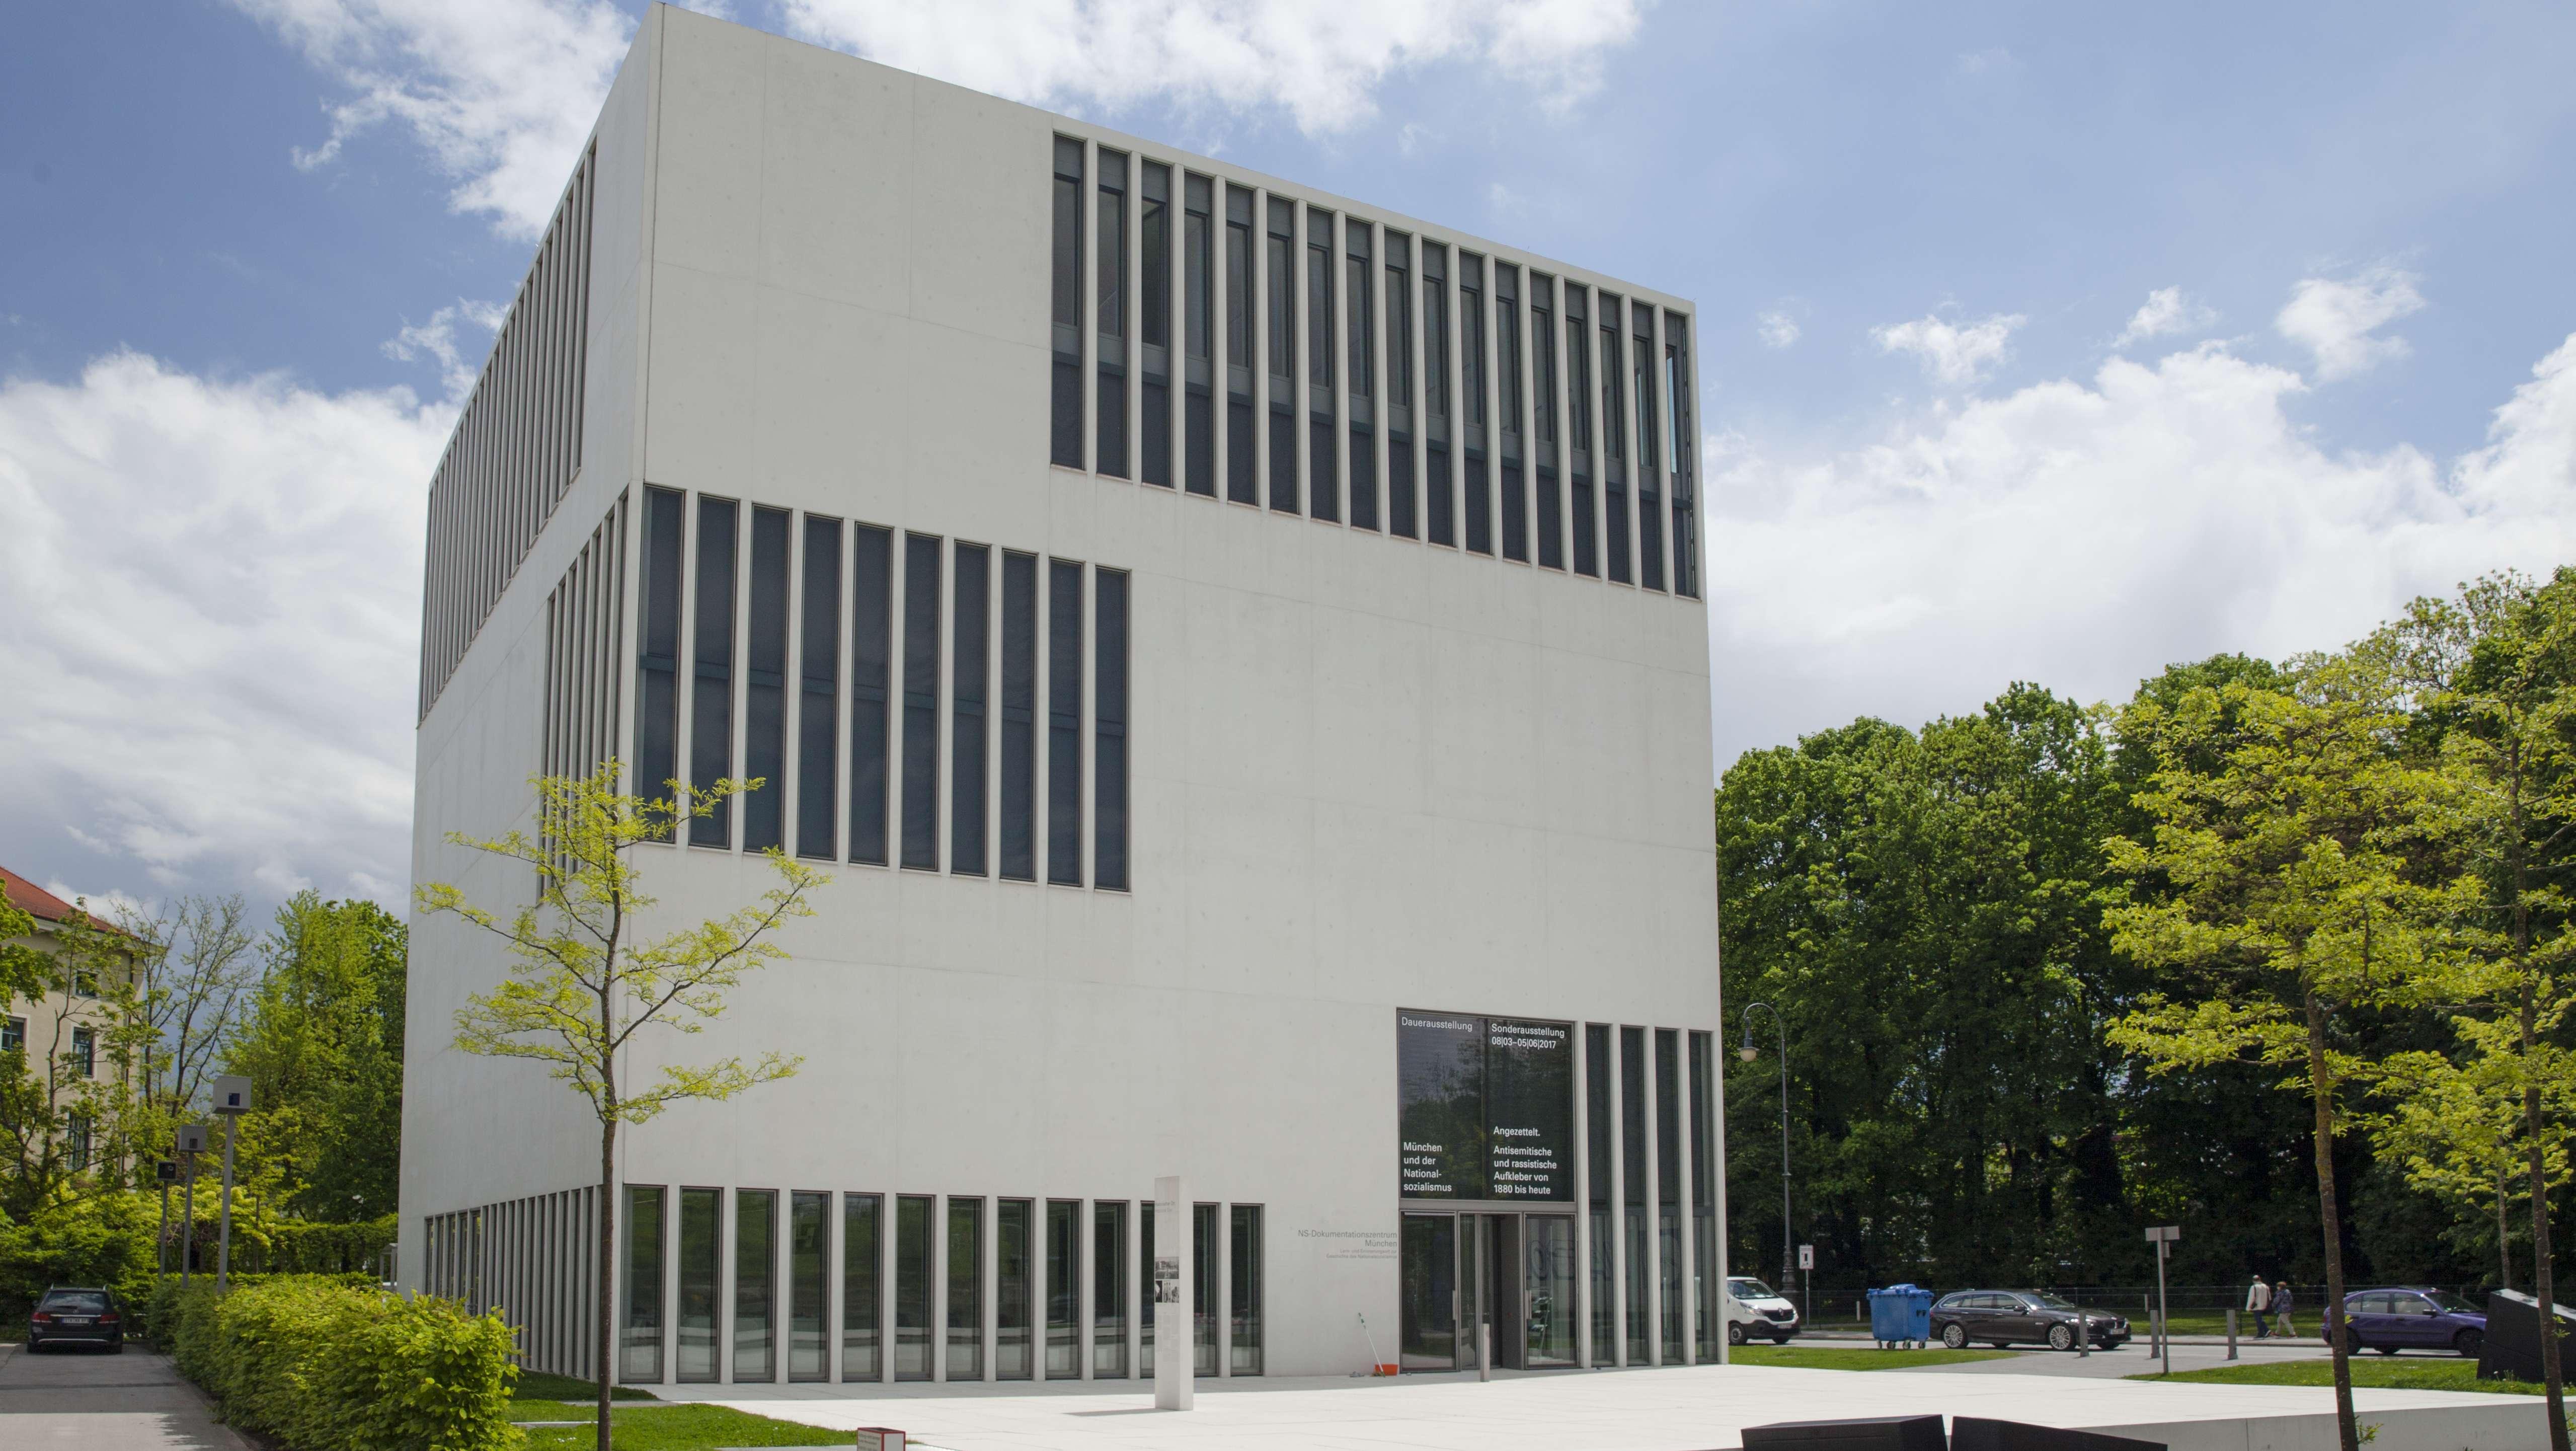 Das NS-Dokumentationszentrum am Max-Mannheimer-Platz